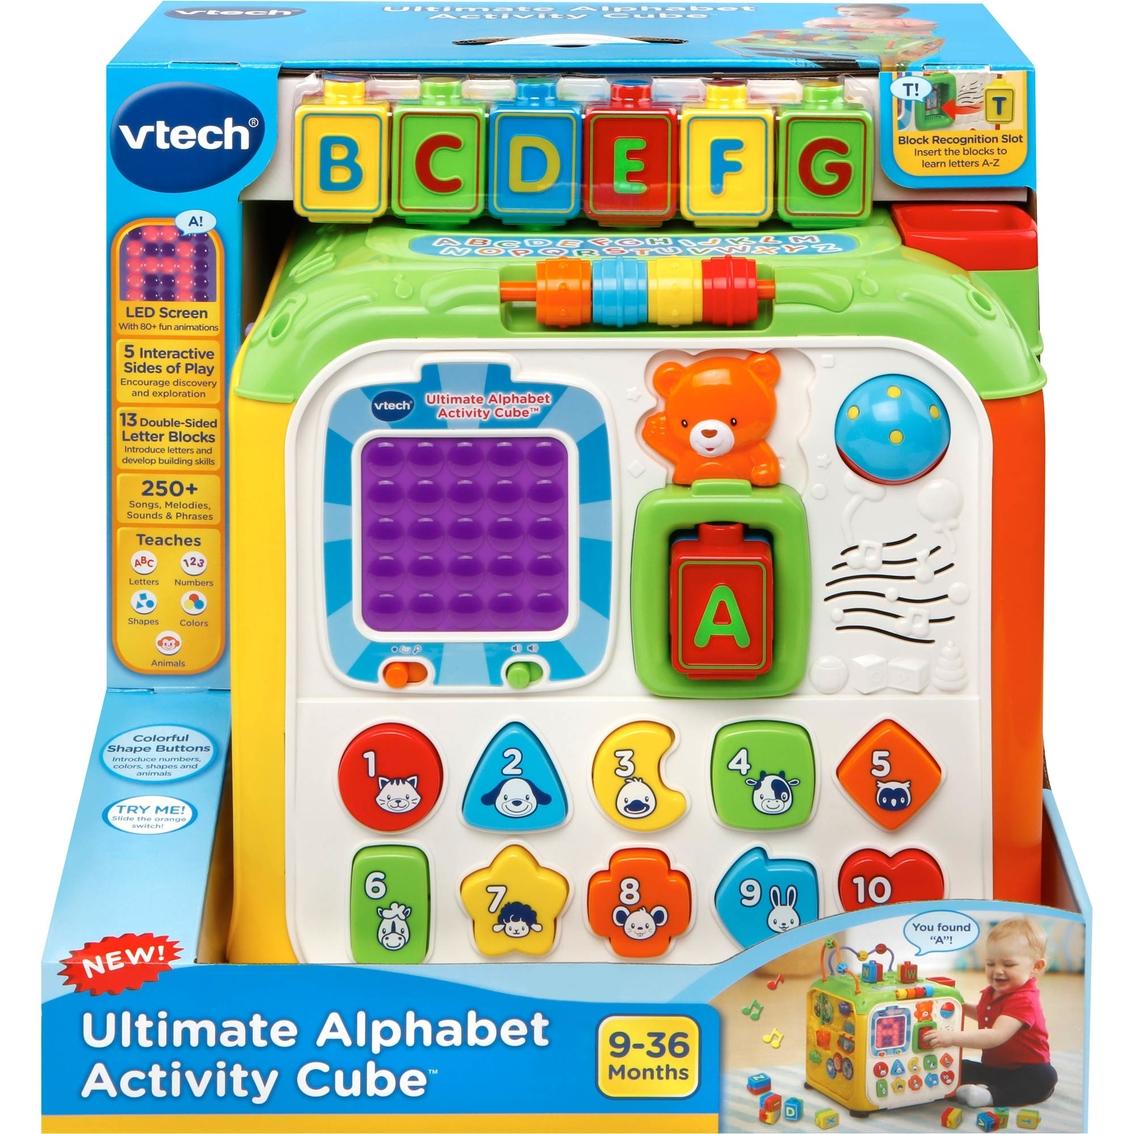 Vtech Ultimate Alphabet Activity Cube Abcs Reading Writing